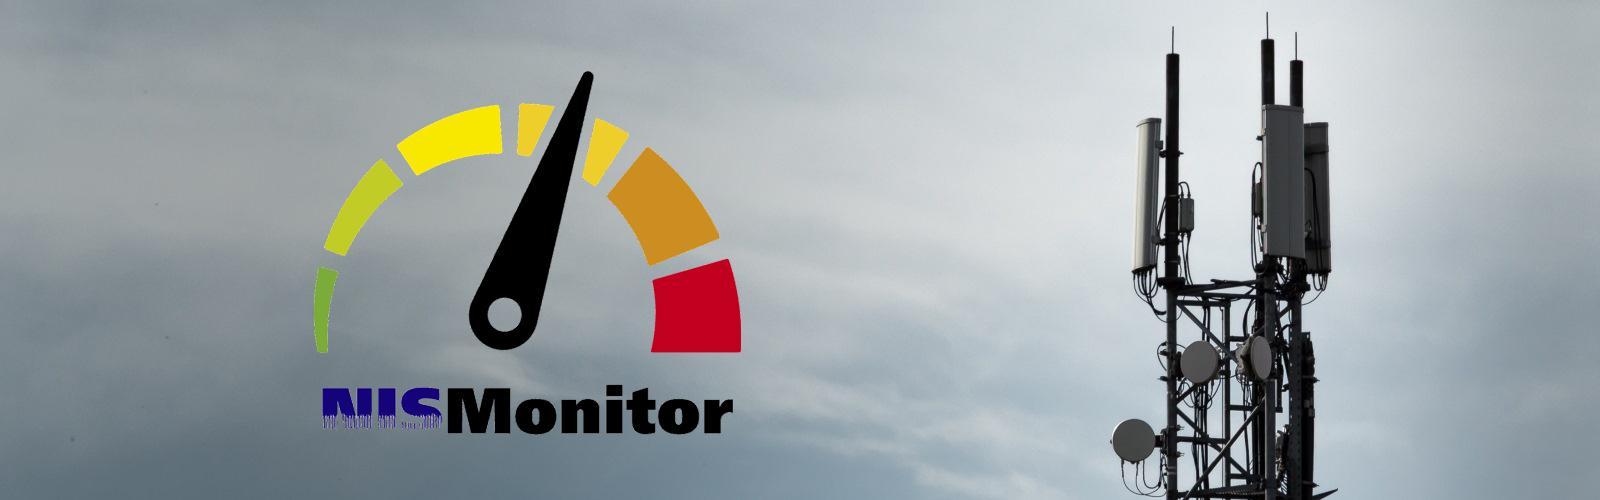 NISMonitor